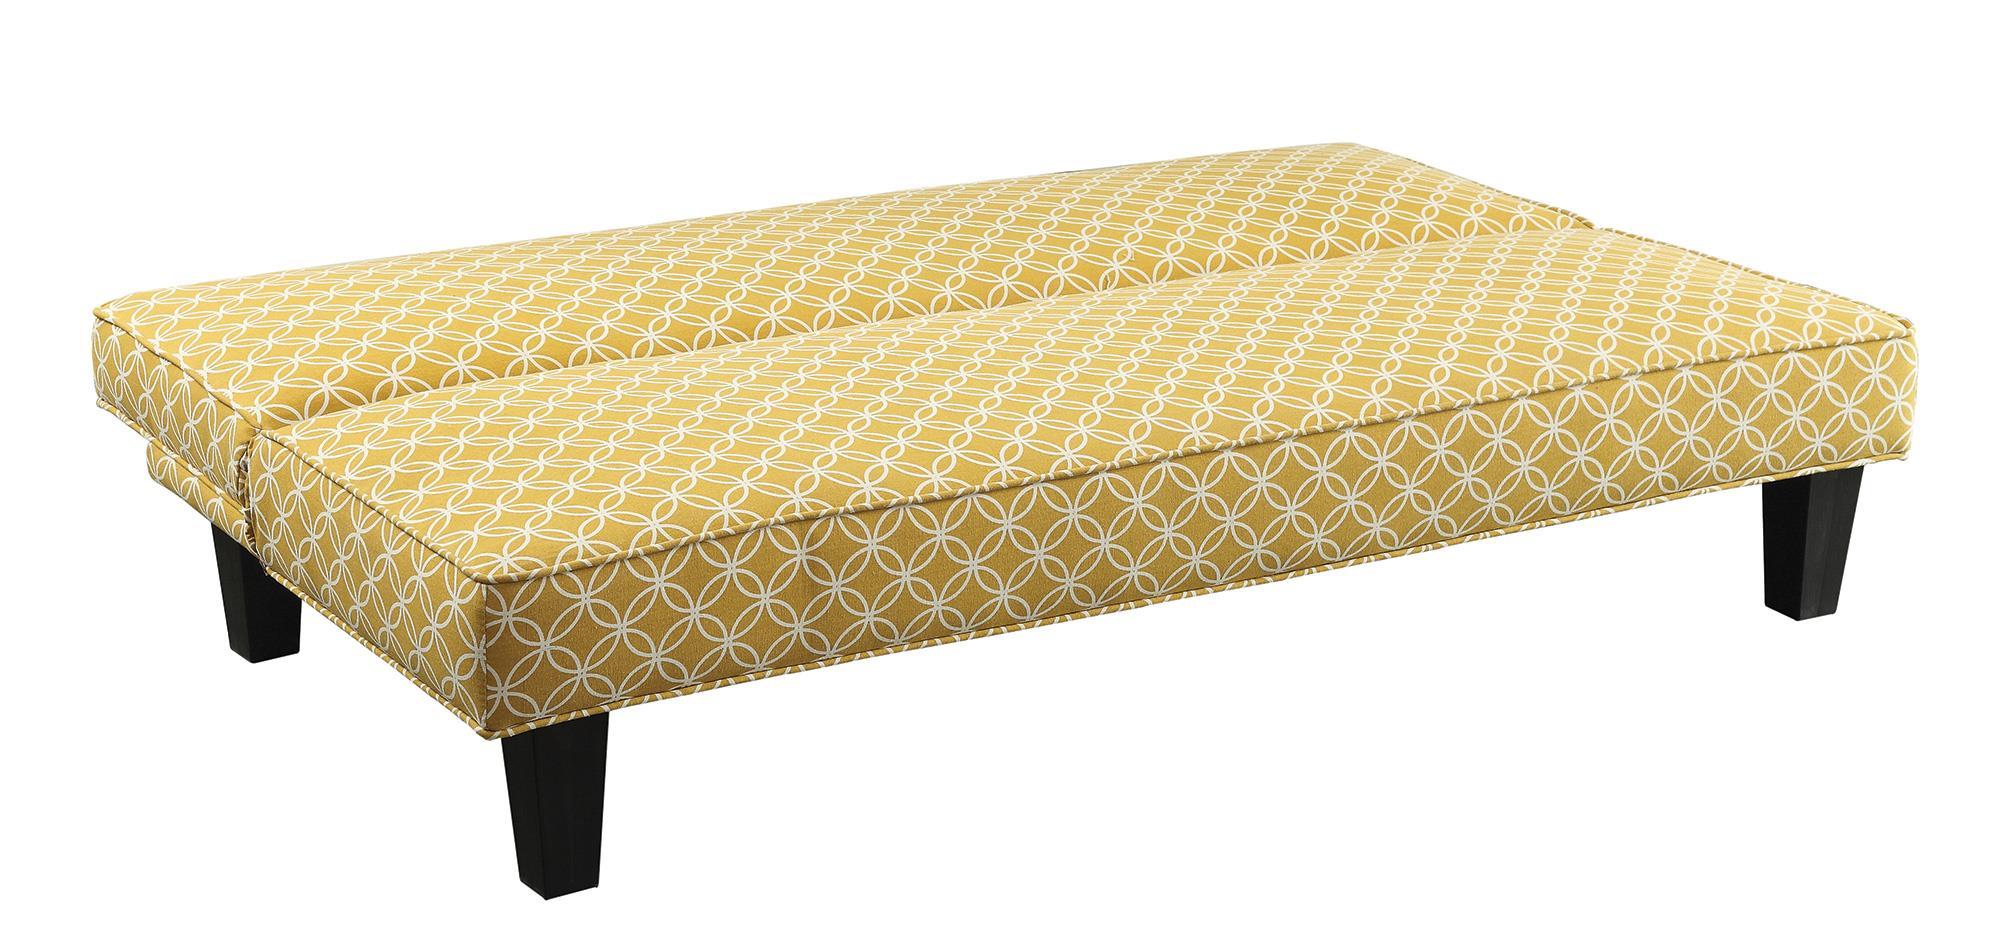 Coaster Futons Sofa Bed - Item Number: 500166